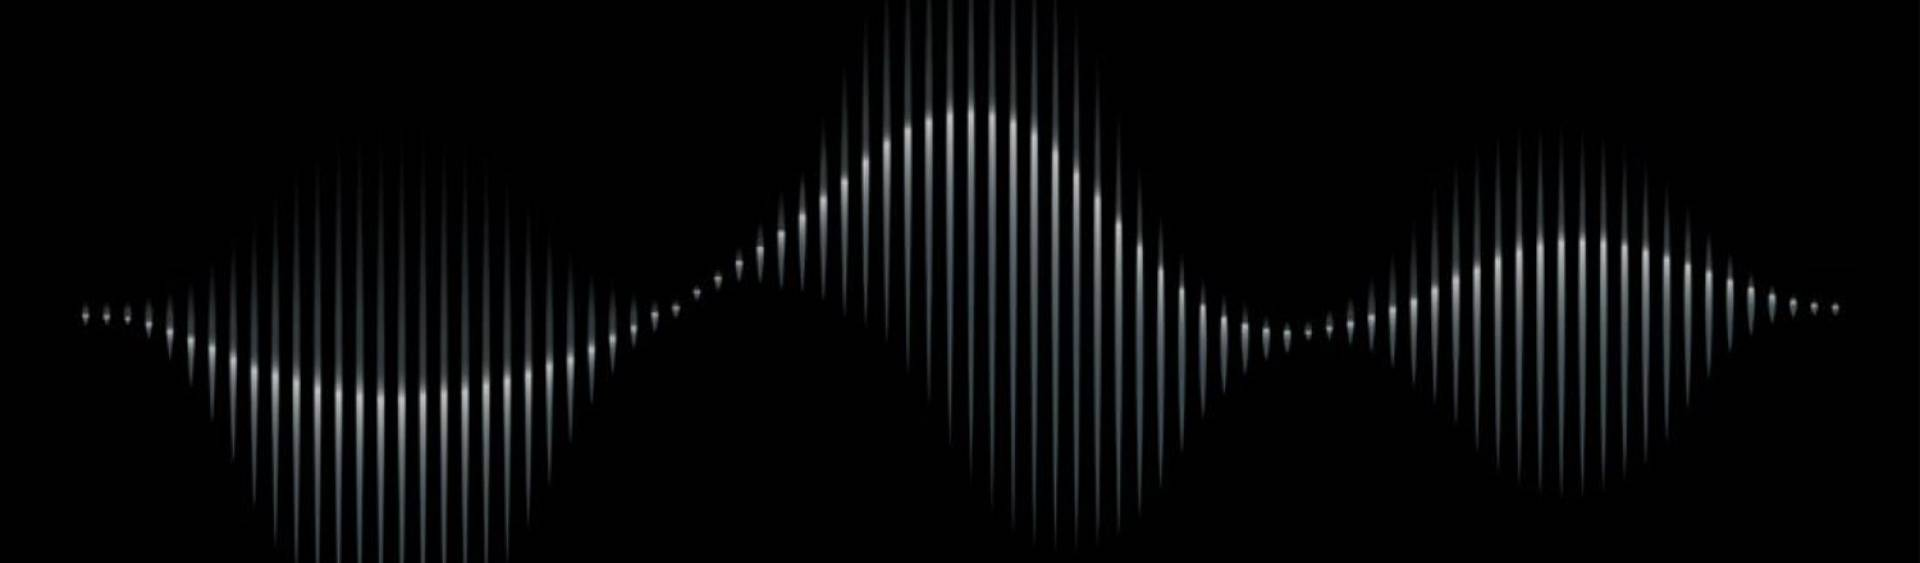 FrameAudio artist cover image